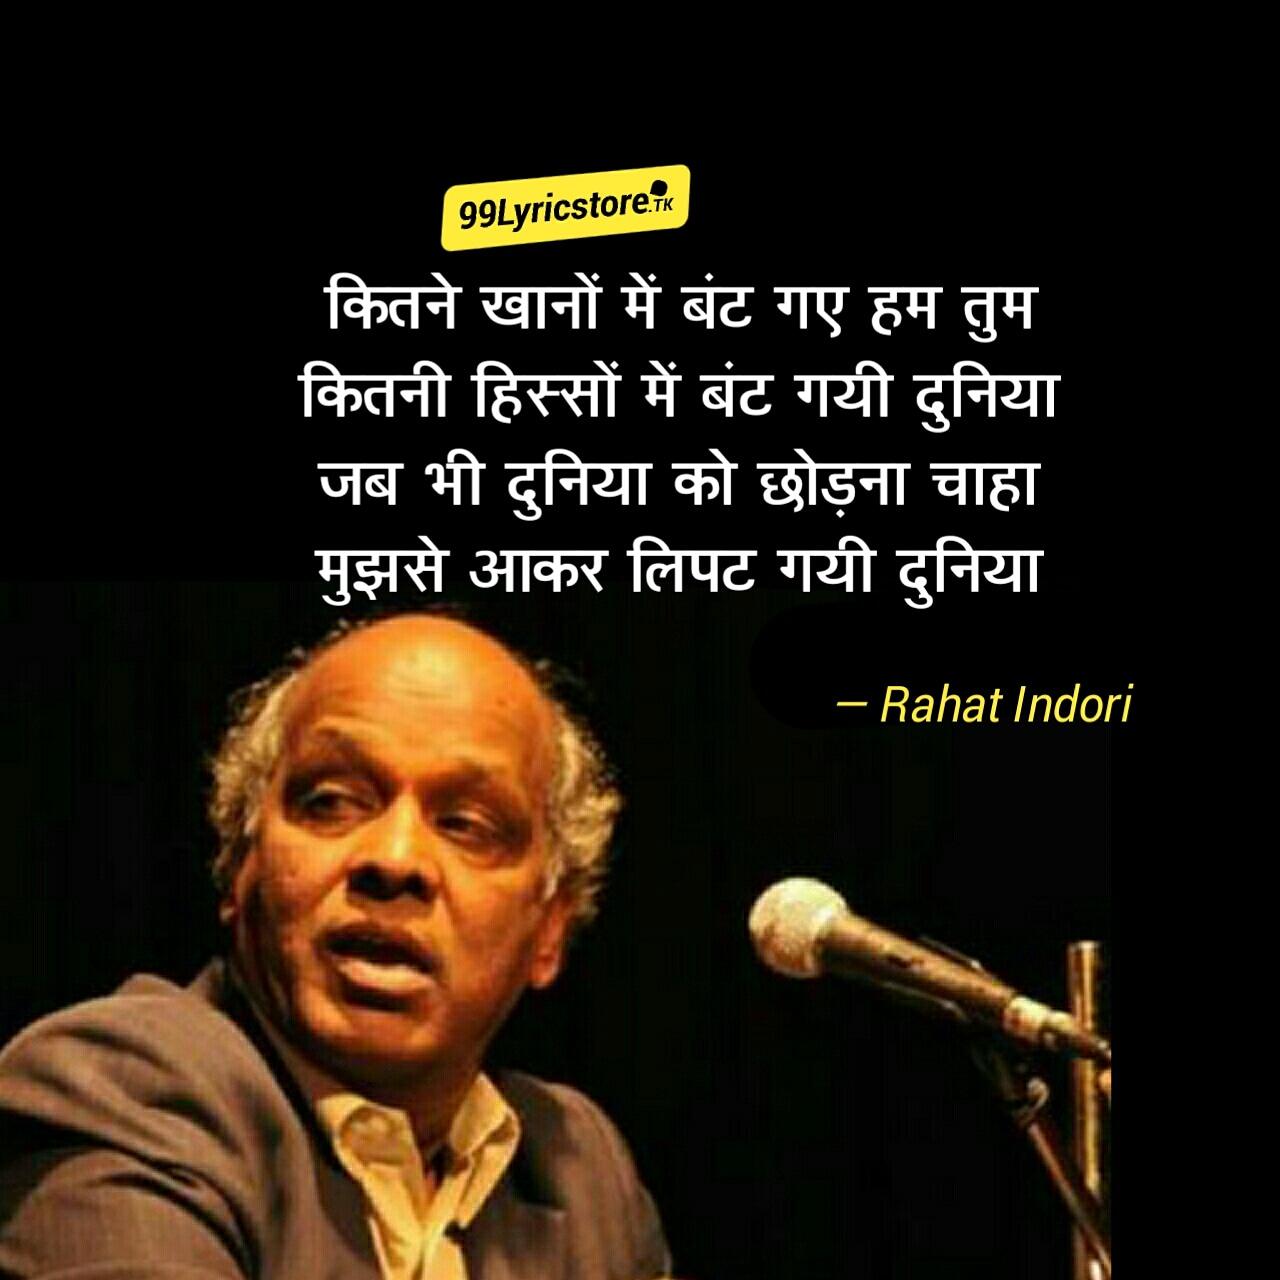 'Badh Gayi Hai Ke Ghat Gayi Duniya' written and performed by Rahat Indori. This poetry is best Ghazal and Shayari of Rahat Indori.